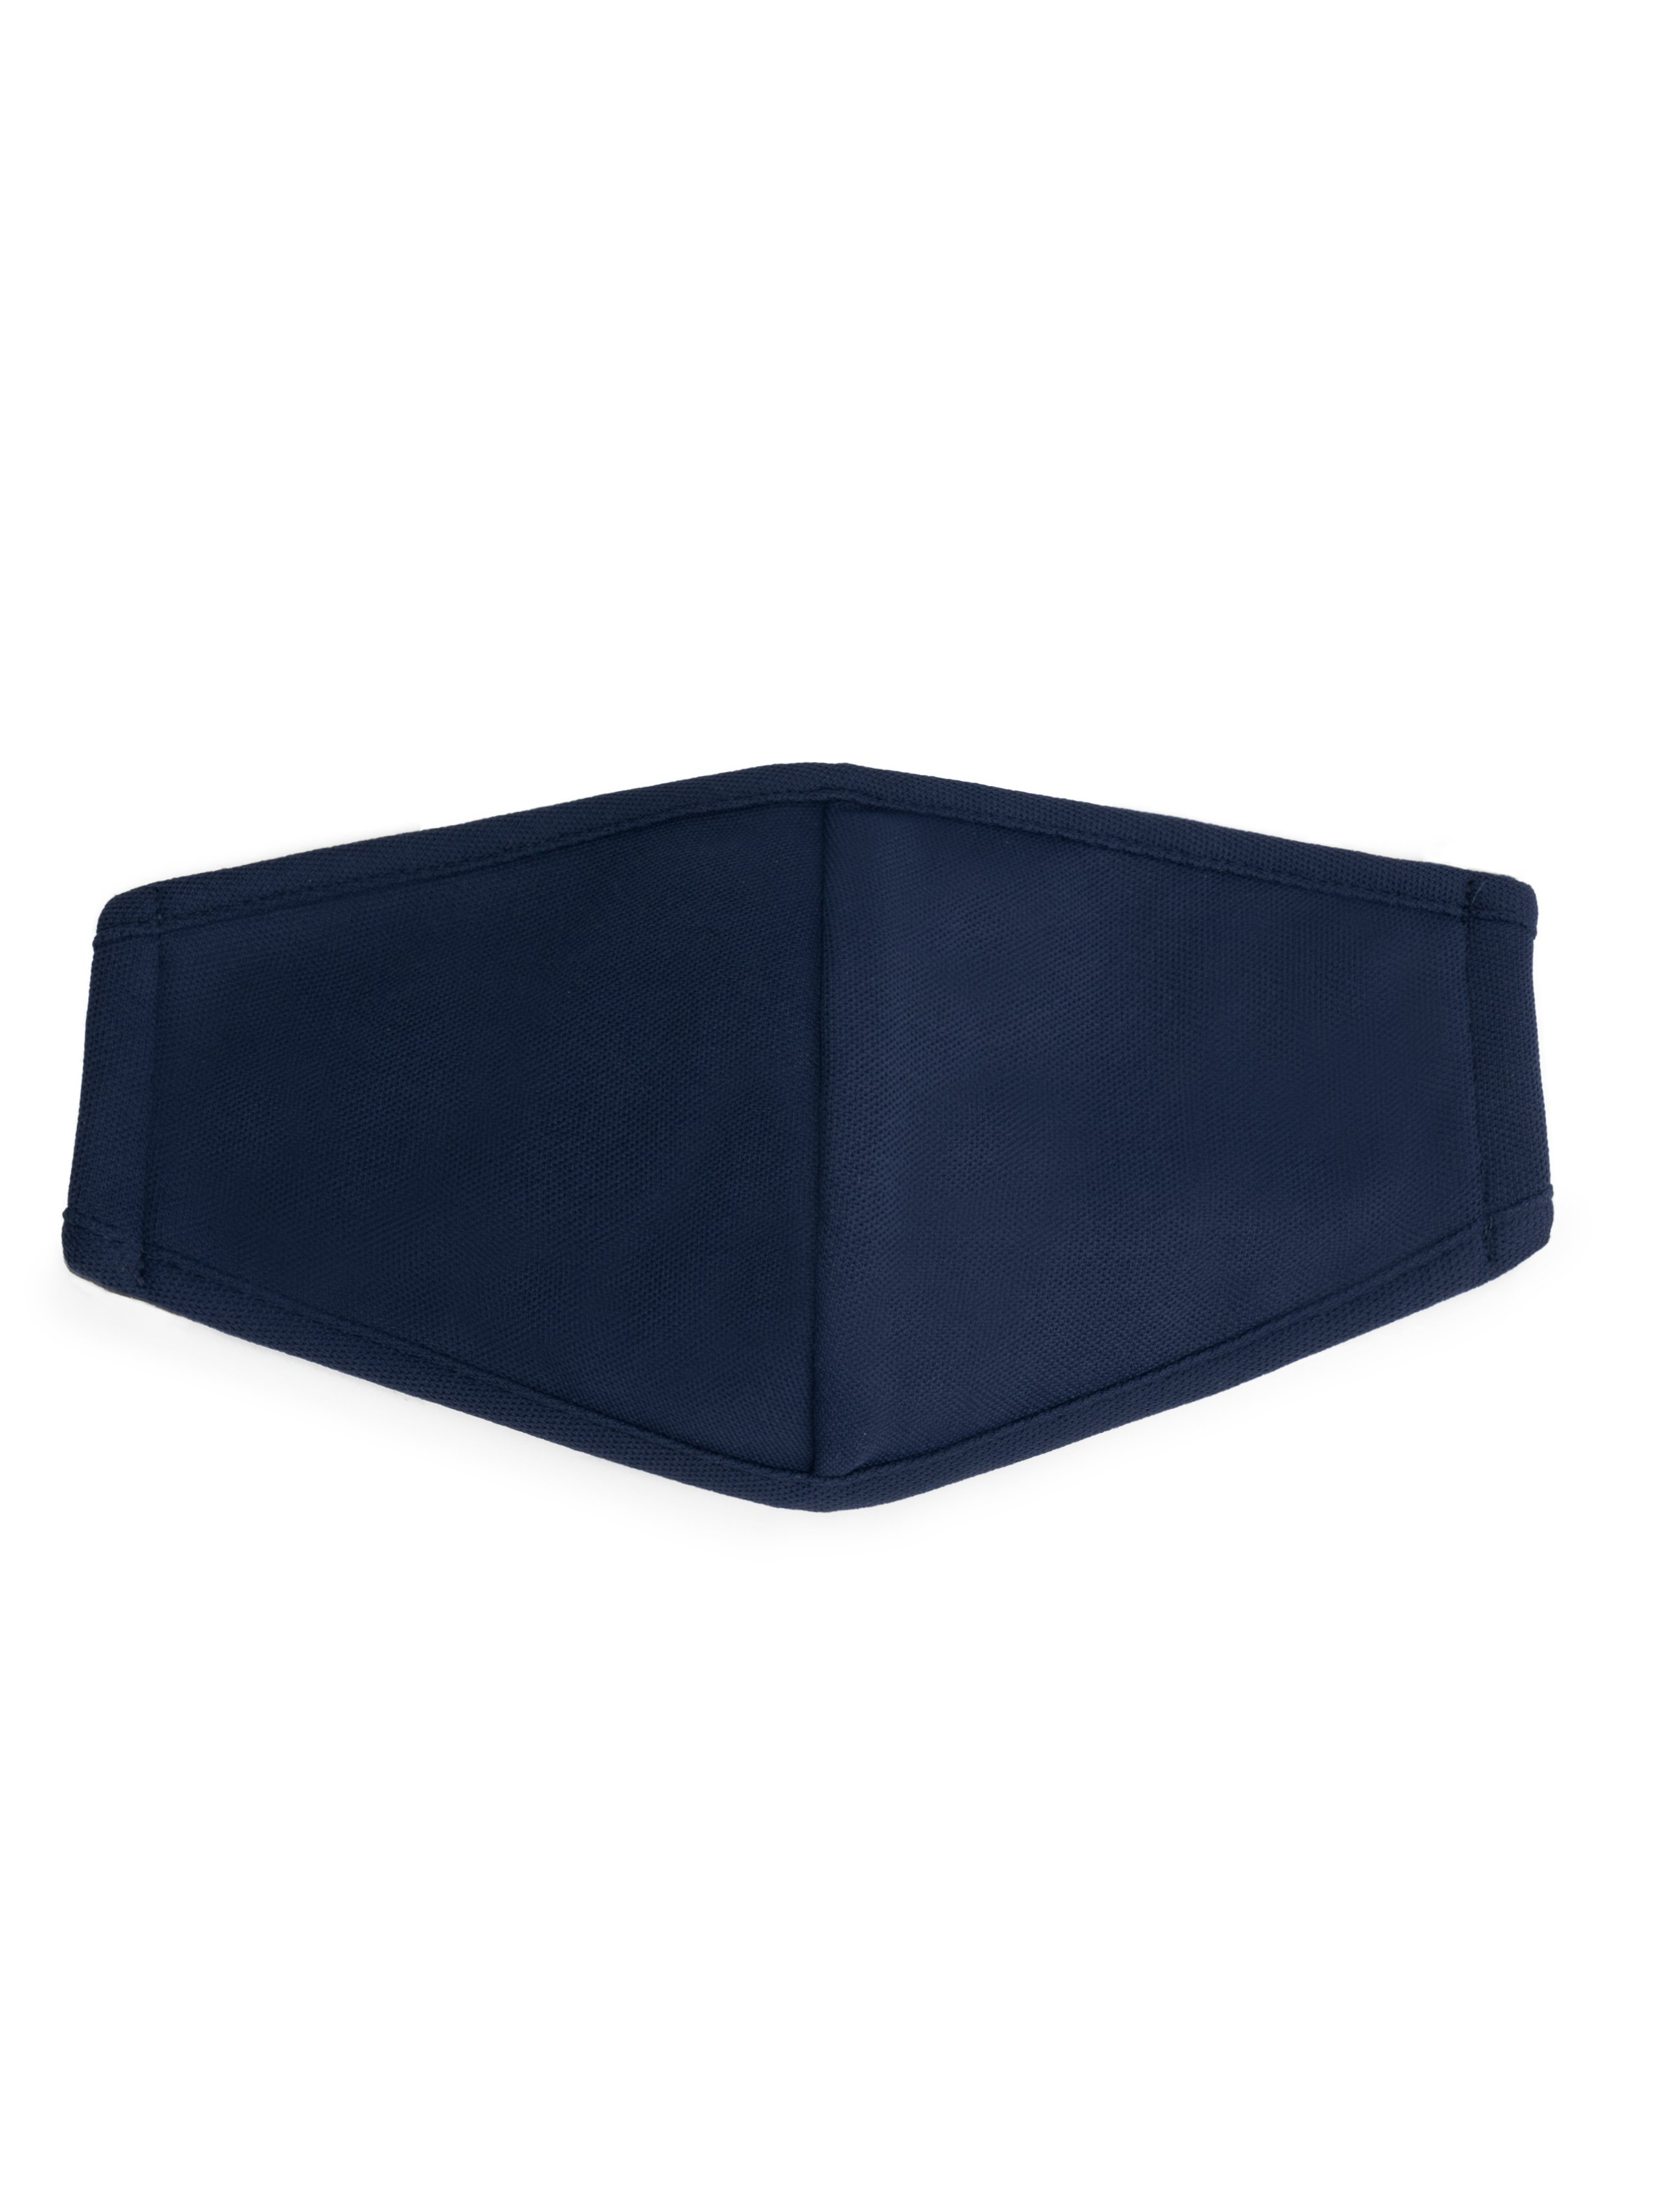 Zubehör LNC2 Patriot Blue